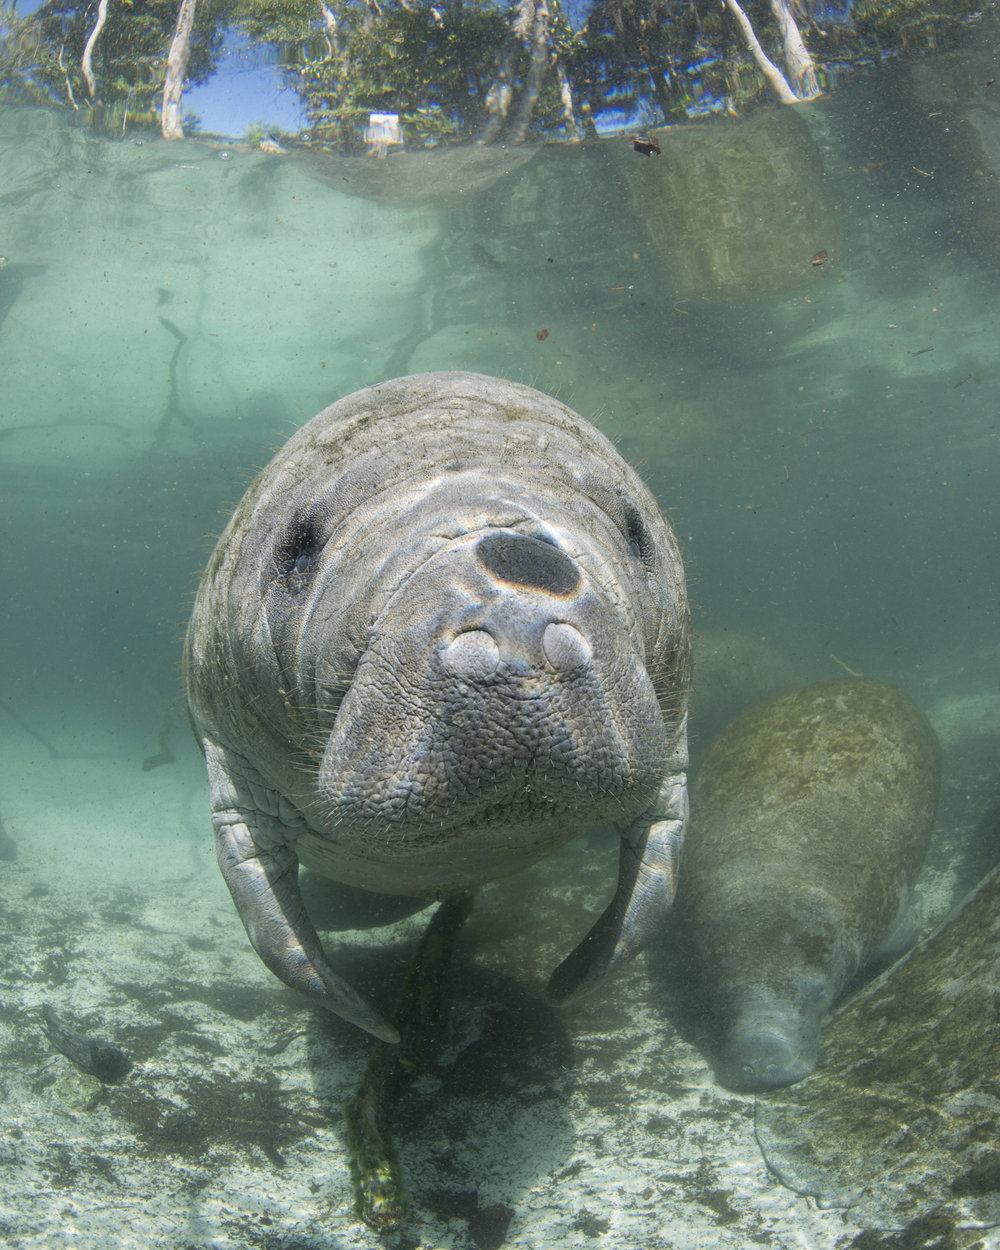 Manatee in Crystal River redit: ellen cuylaerts / coral reef image bank